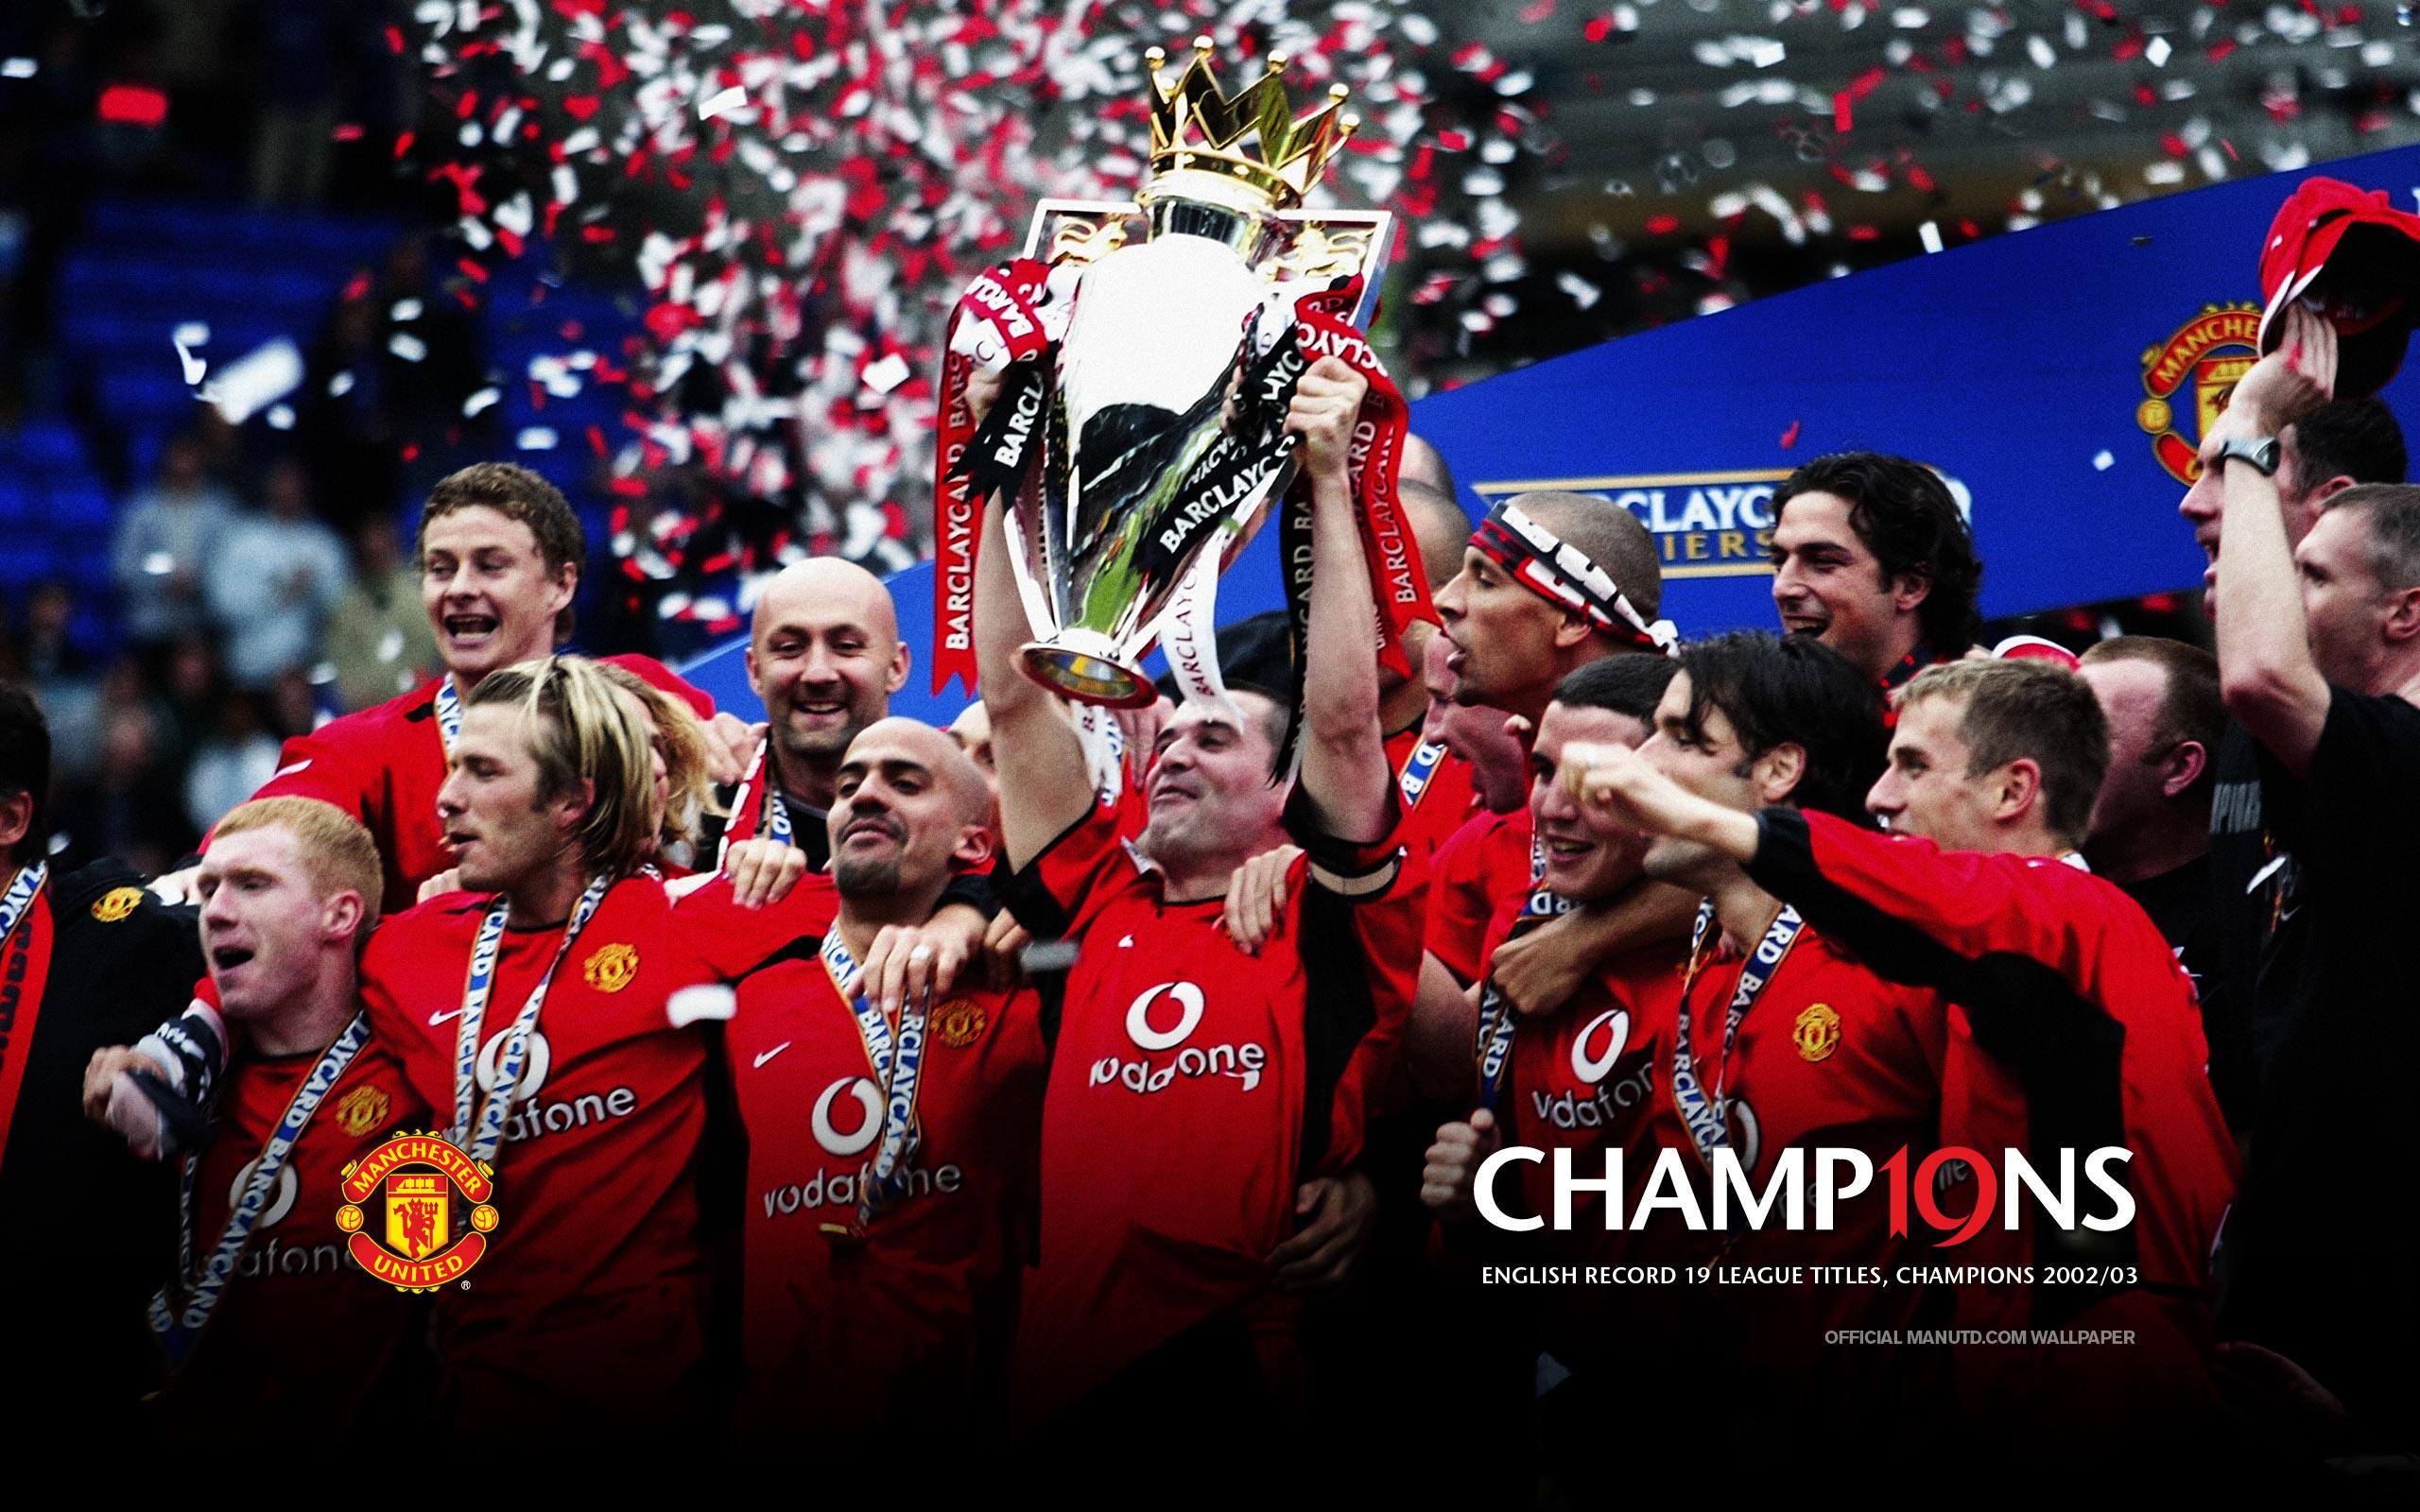 Wallpaper Man Utd Hd Champions 19 Manchester United Wallpaper